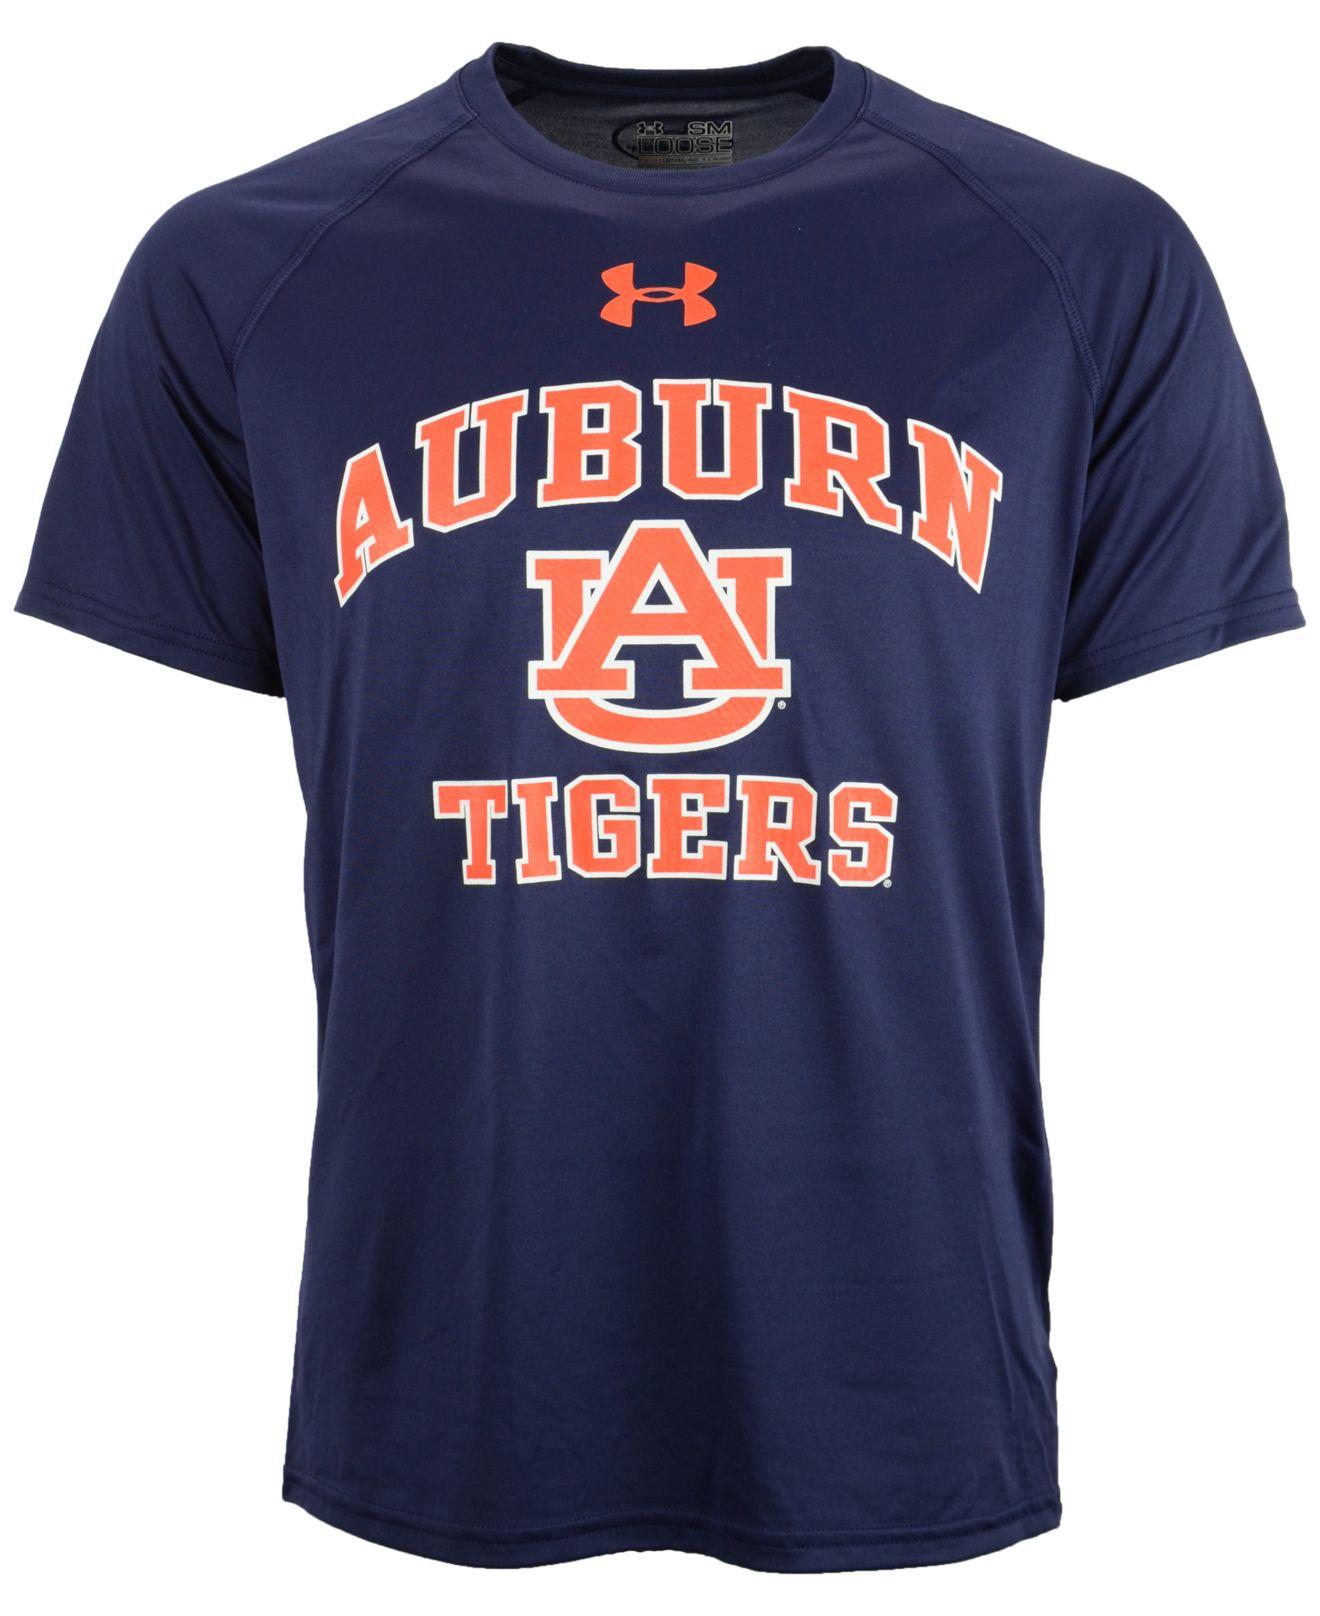 Lyst Under Armour Men S Short Sleeve Auburn Tigers T